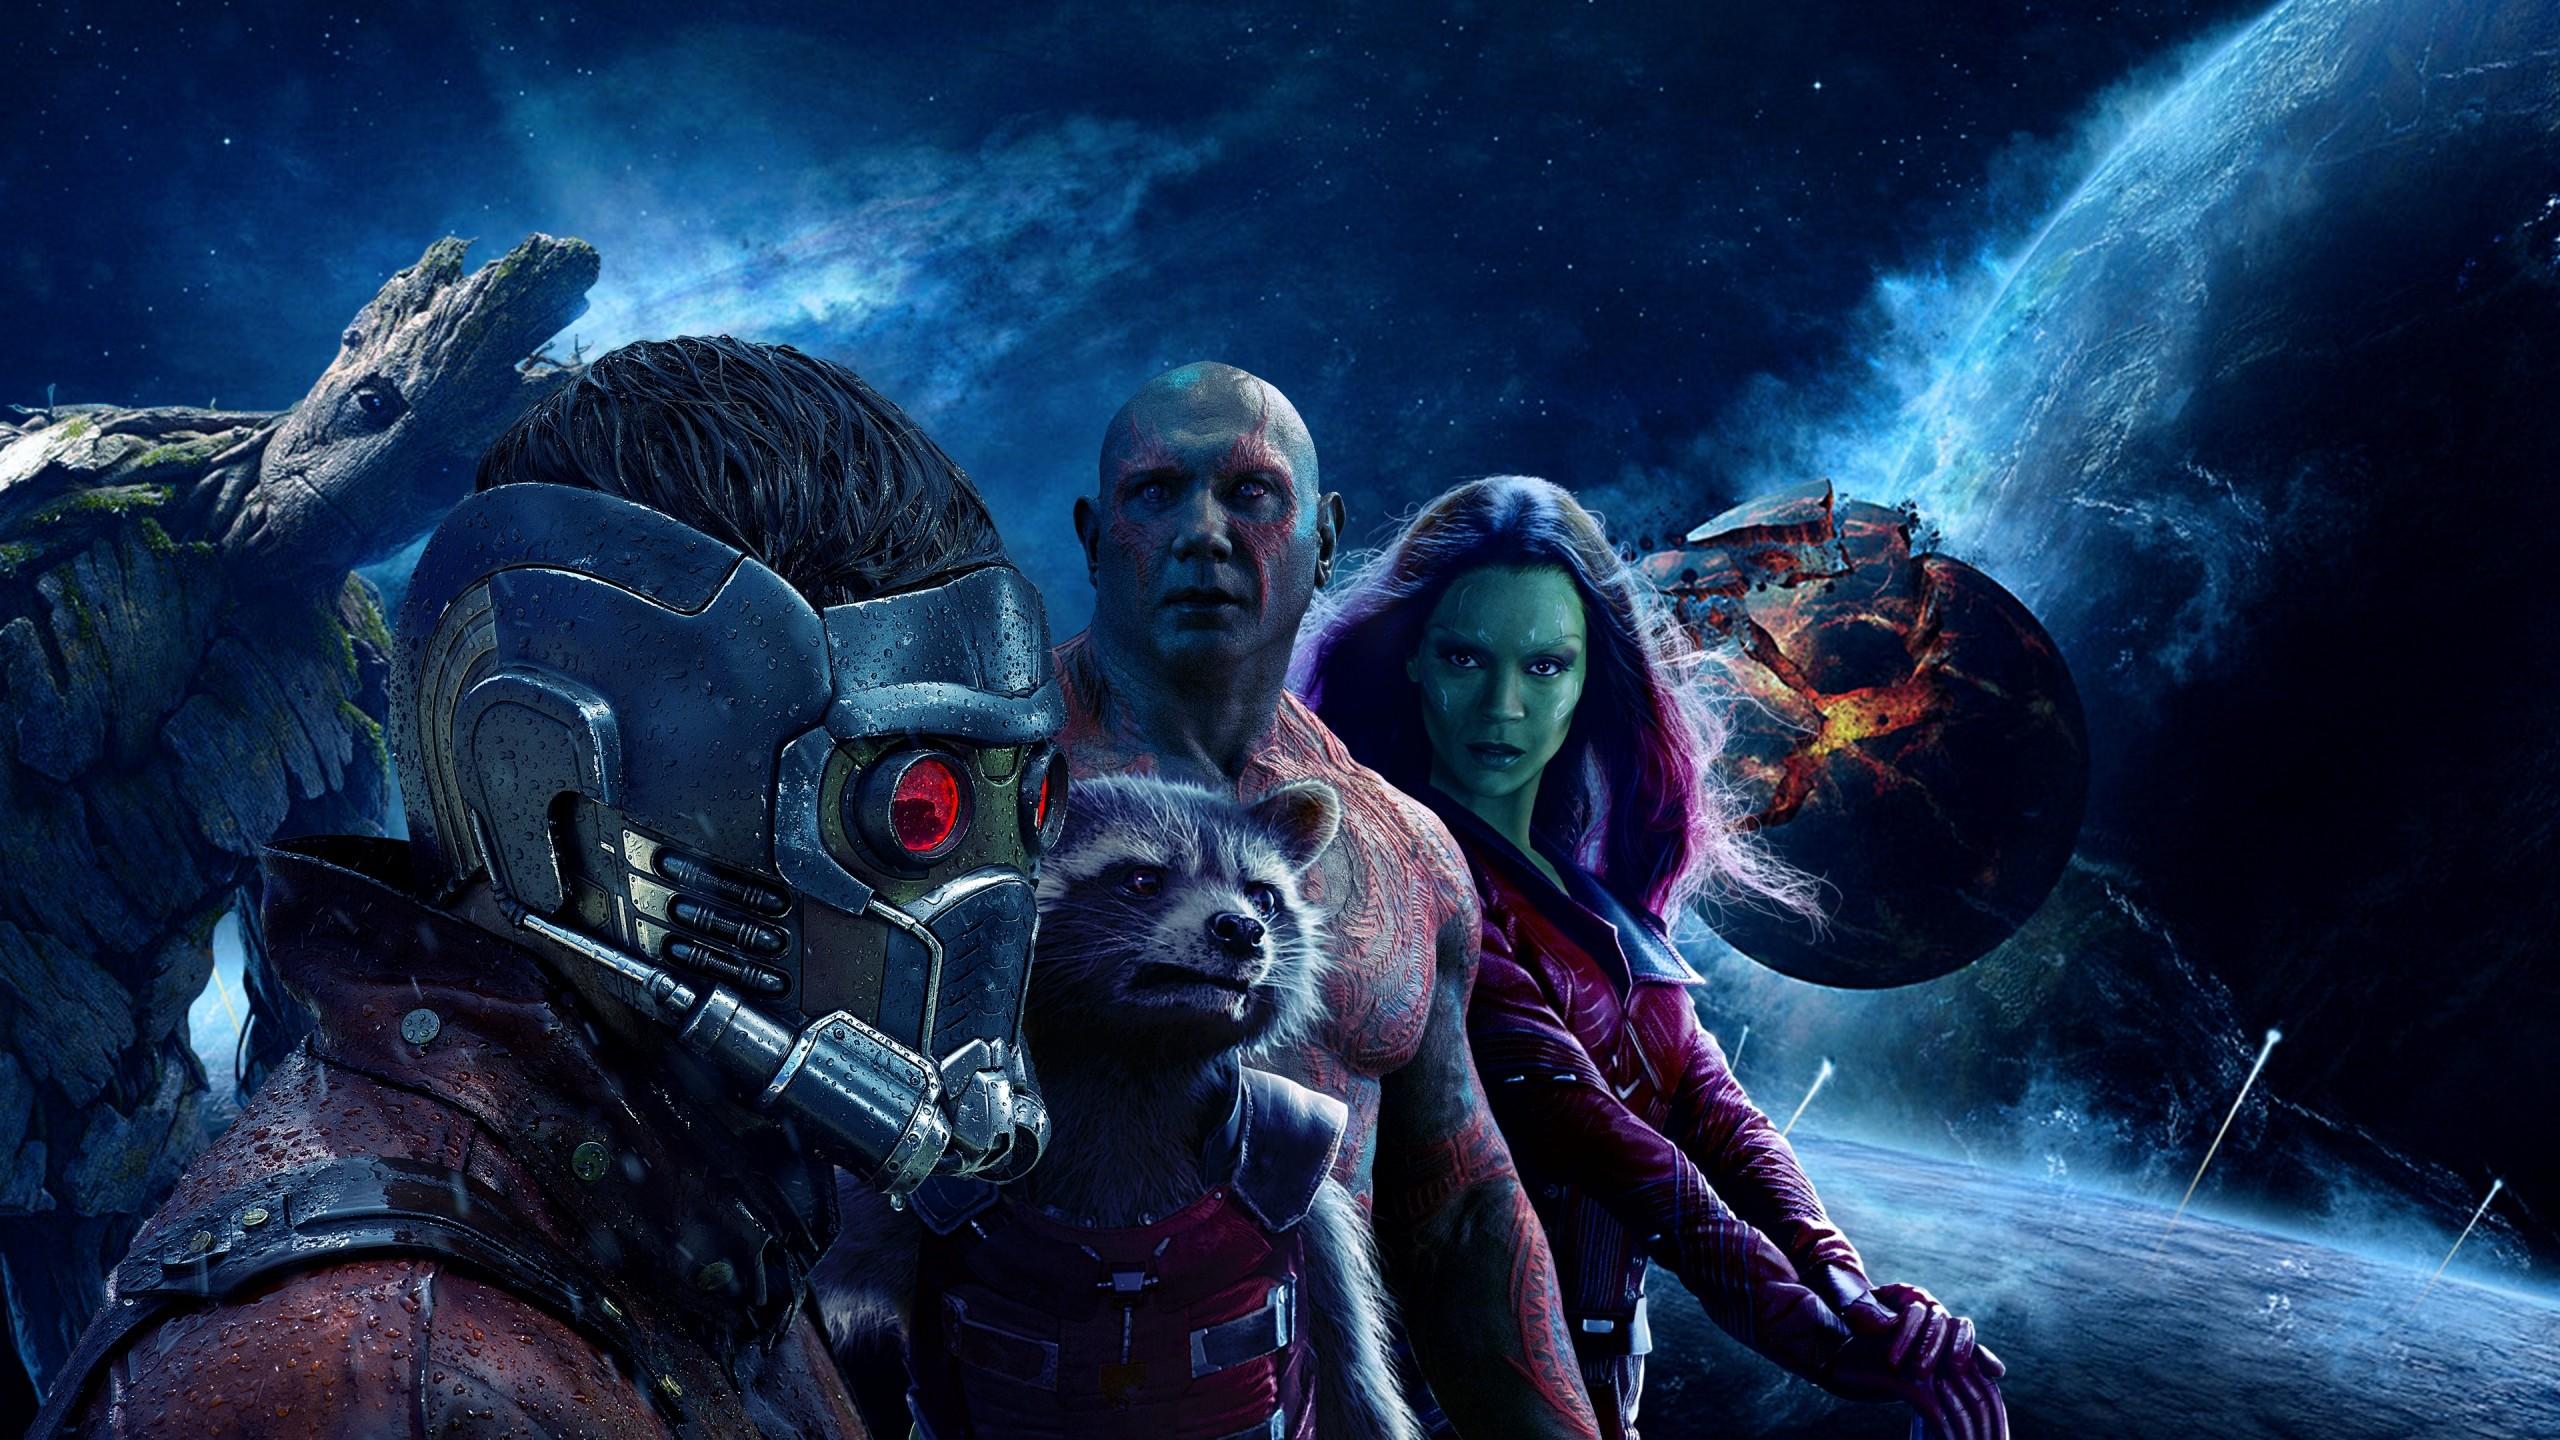 Wallpaper guardians of the galaxy vol 2, peter quill, gamora,  rocket,